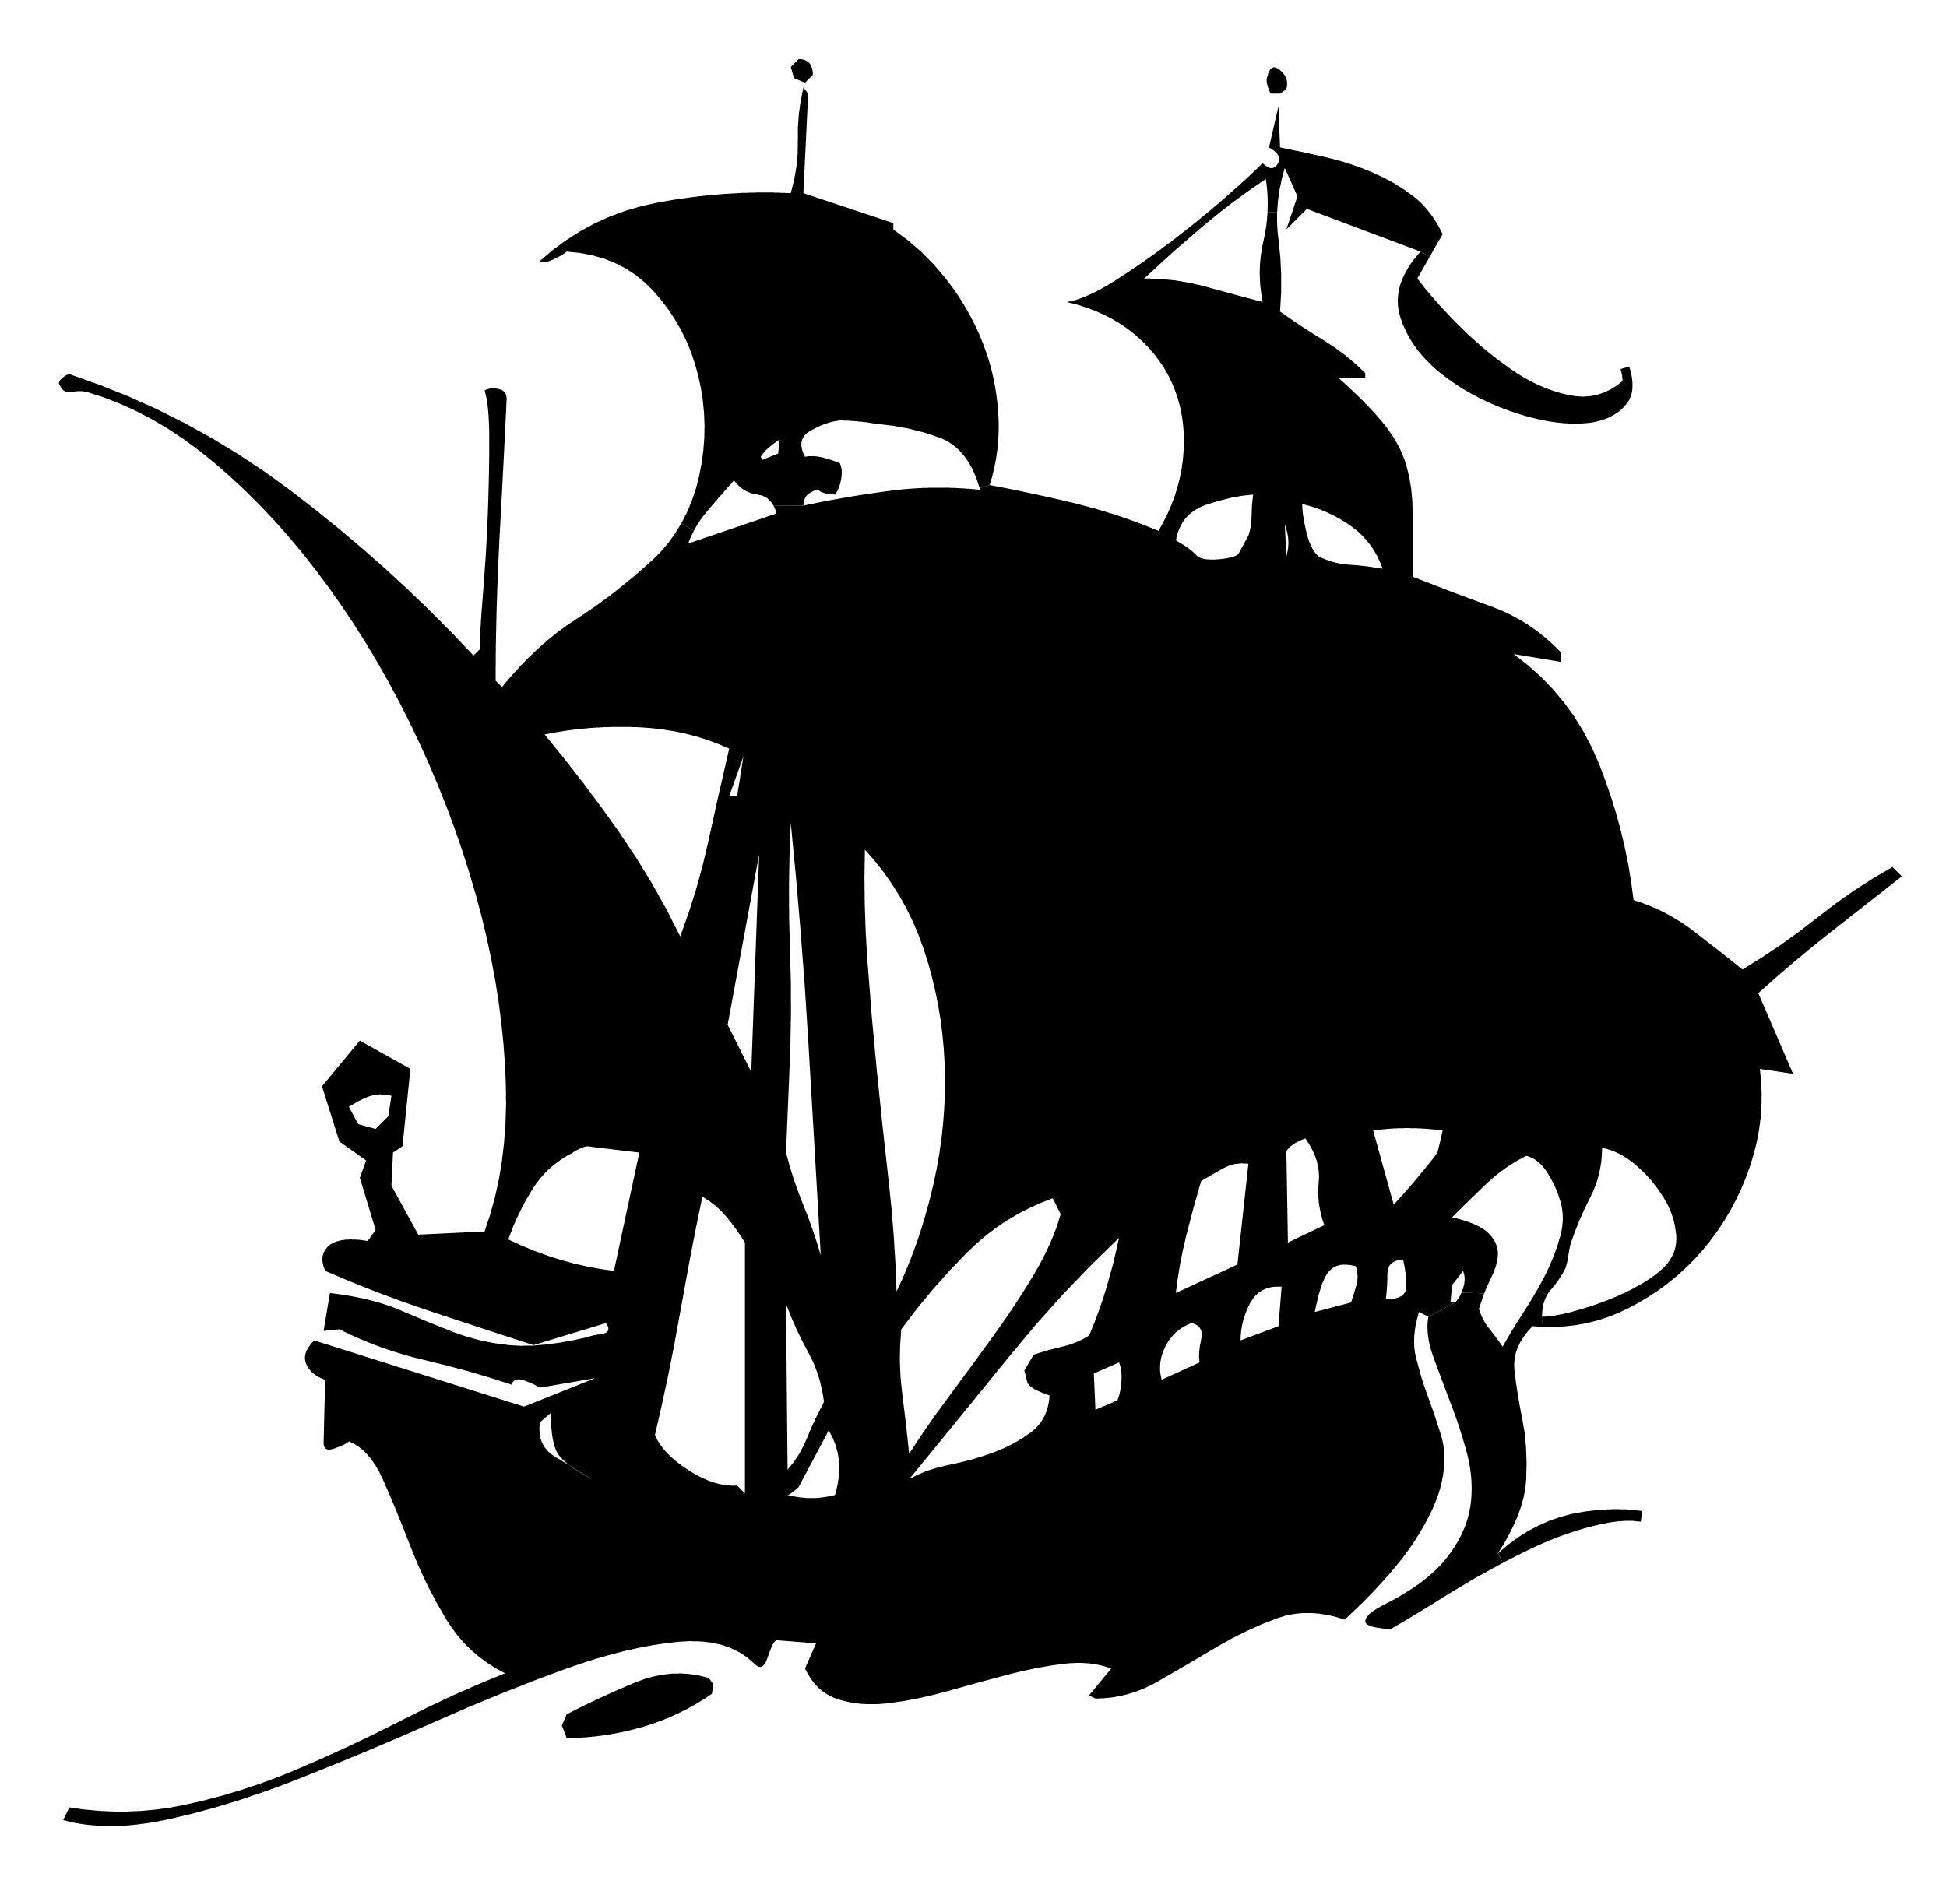 Unique Dessin A Imprimer De Bateau Pirate